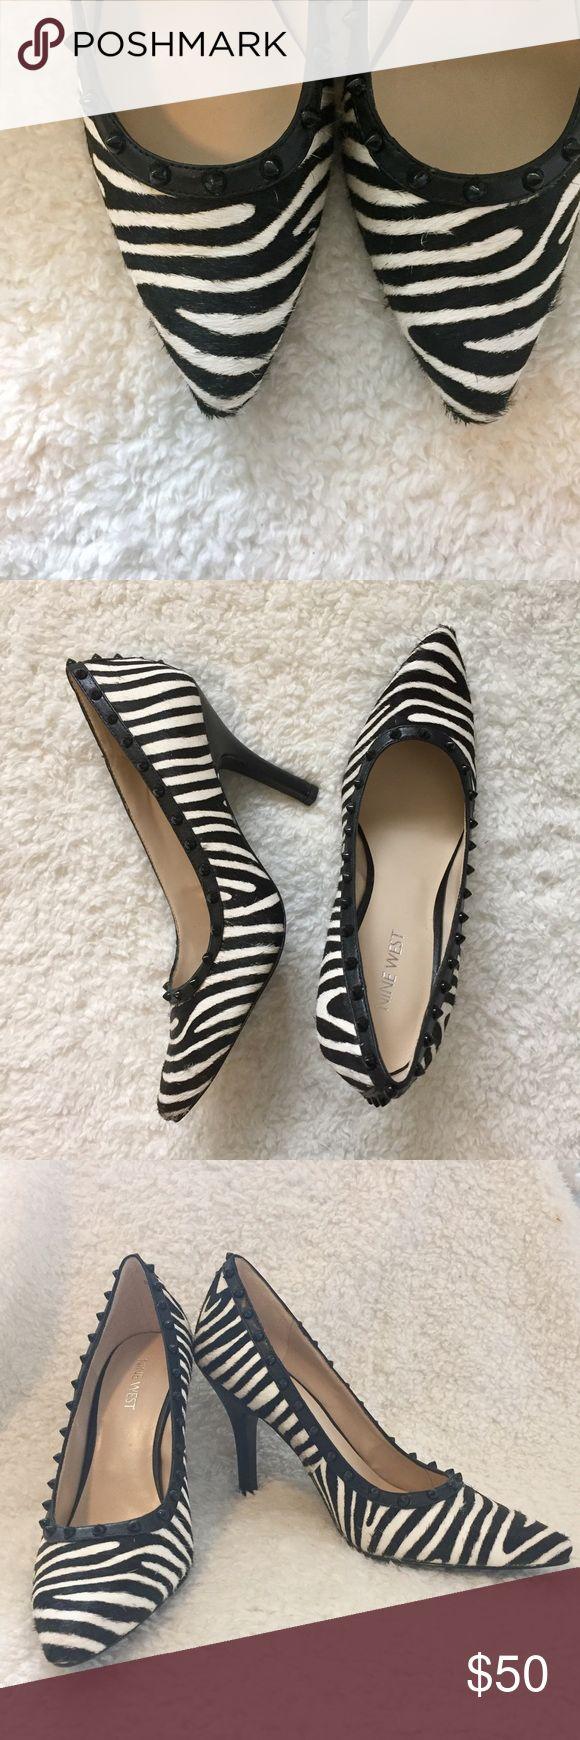 NWOT: Nine West Zebra Heels. Nine West, size 7, NWOT, Zebra Print heels with black studded accents. Nine West Shoes Heels